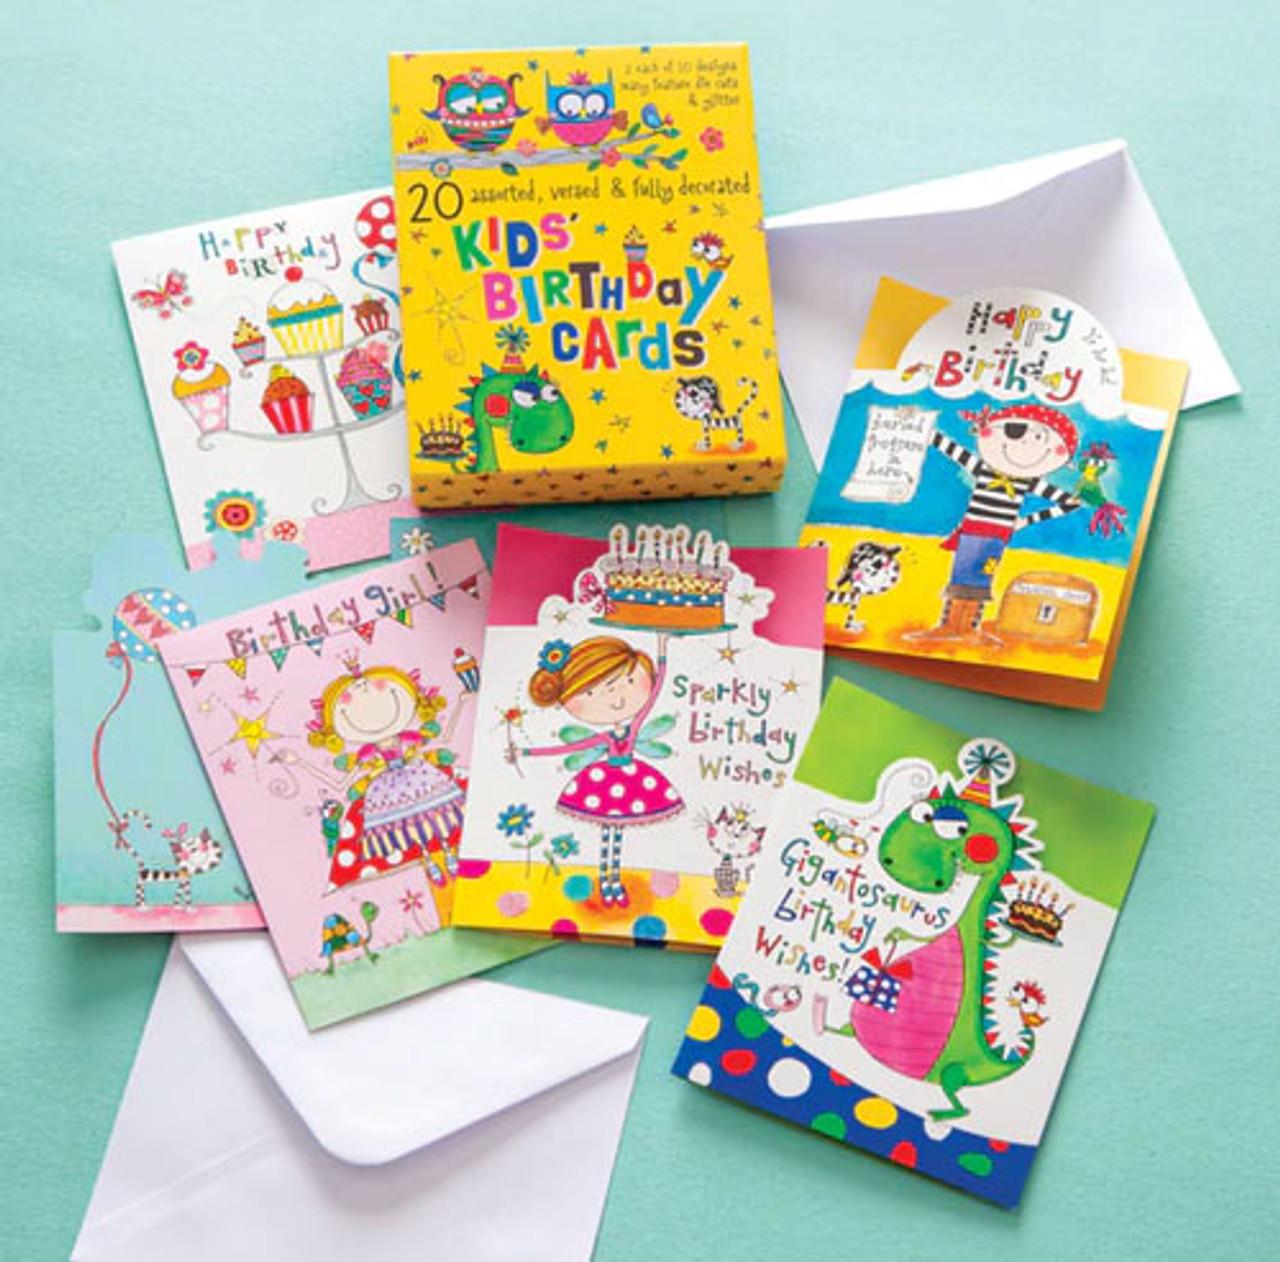 Enjoyable Kids Birthday Card Assortment Hjba21927 Shopittakestwo Personalised Birthday Cards Paralily Jamesorg